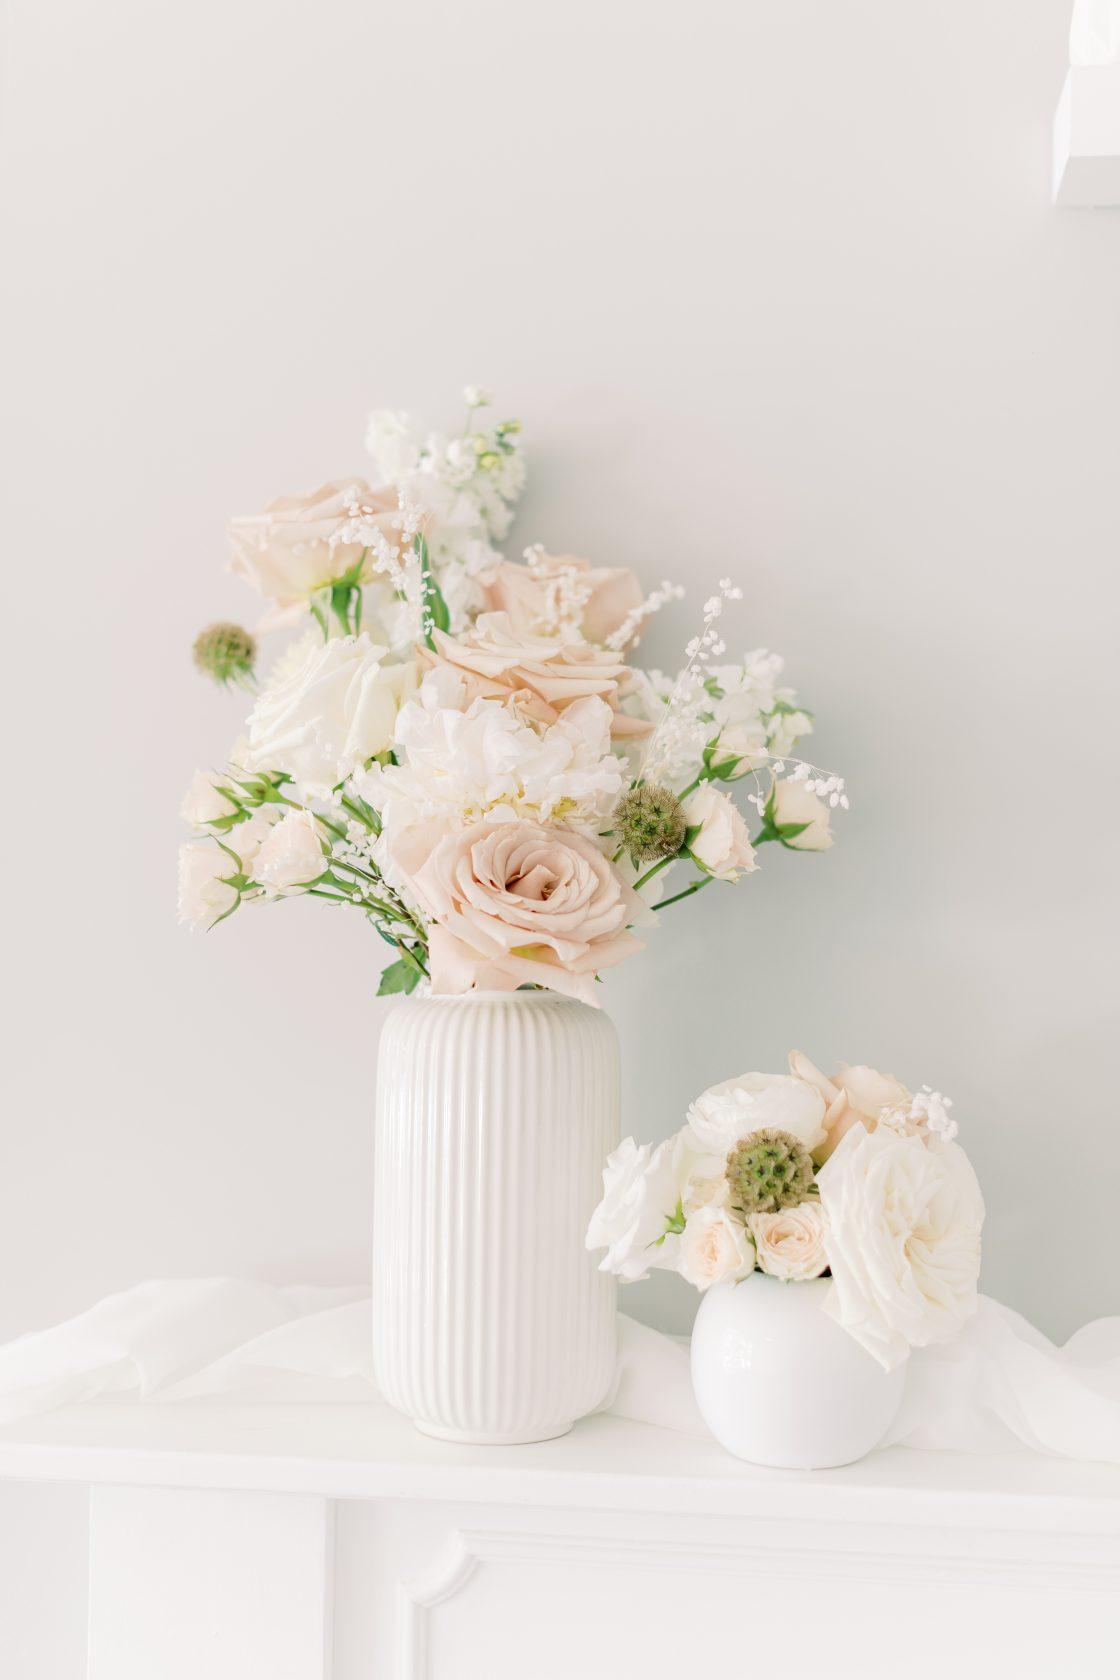 White Blush Rose Centerpiece